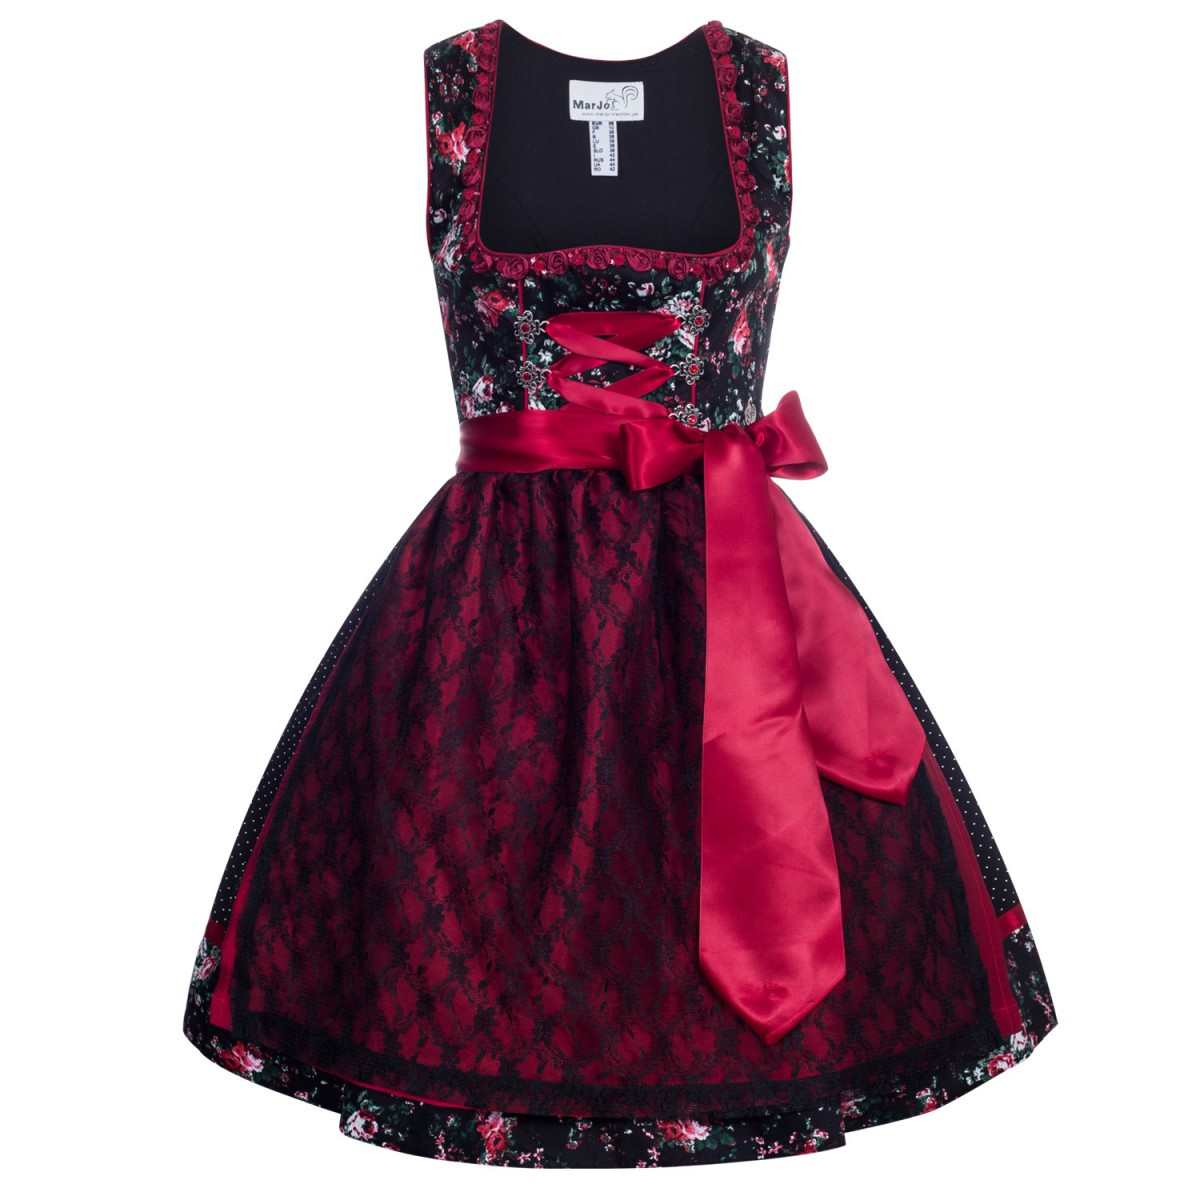 Dirndl traditional german dress on pinterest dirndl for Trachten finest